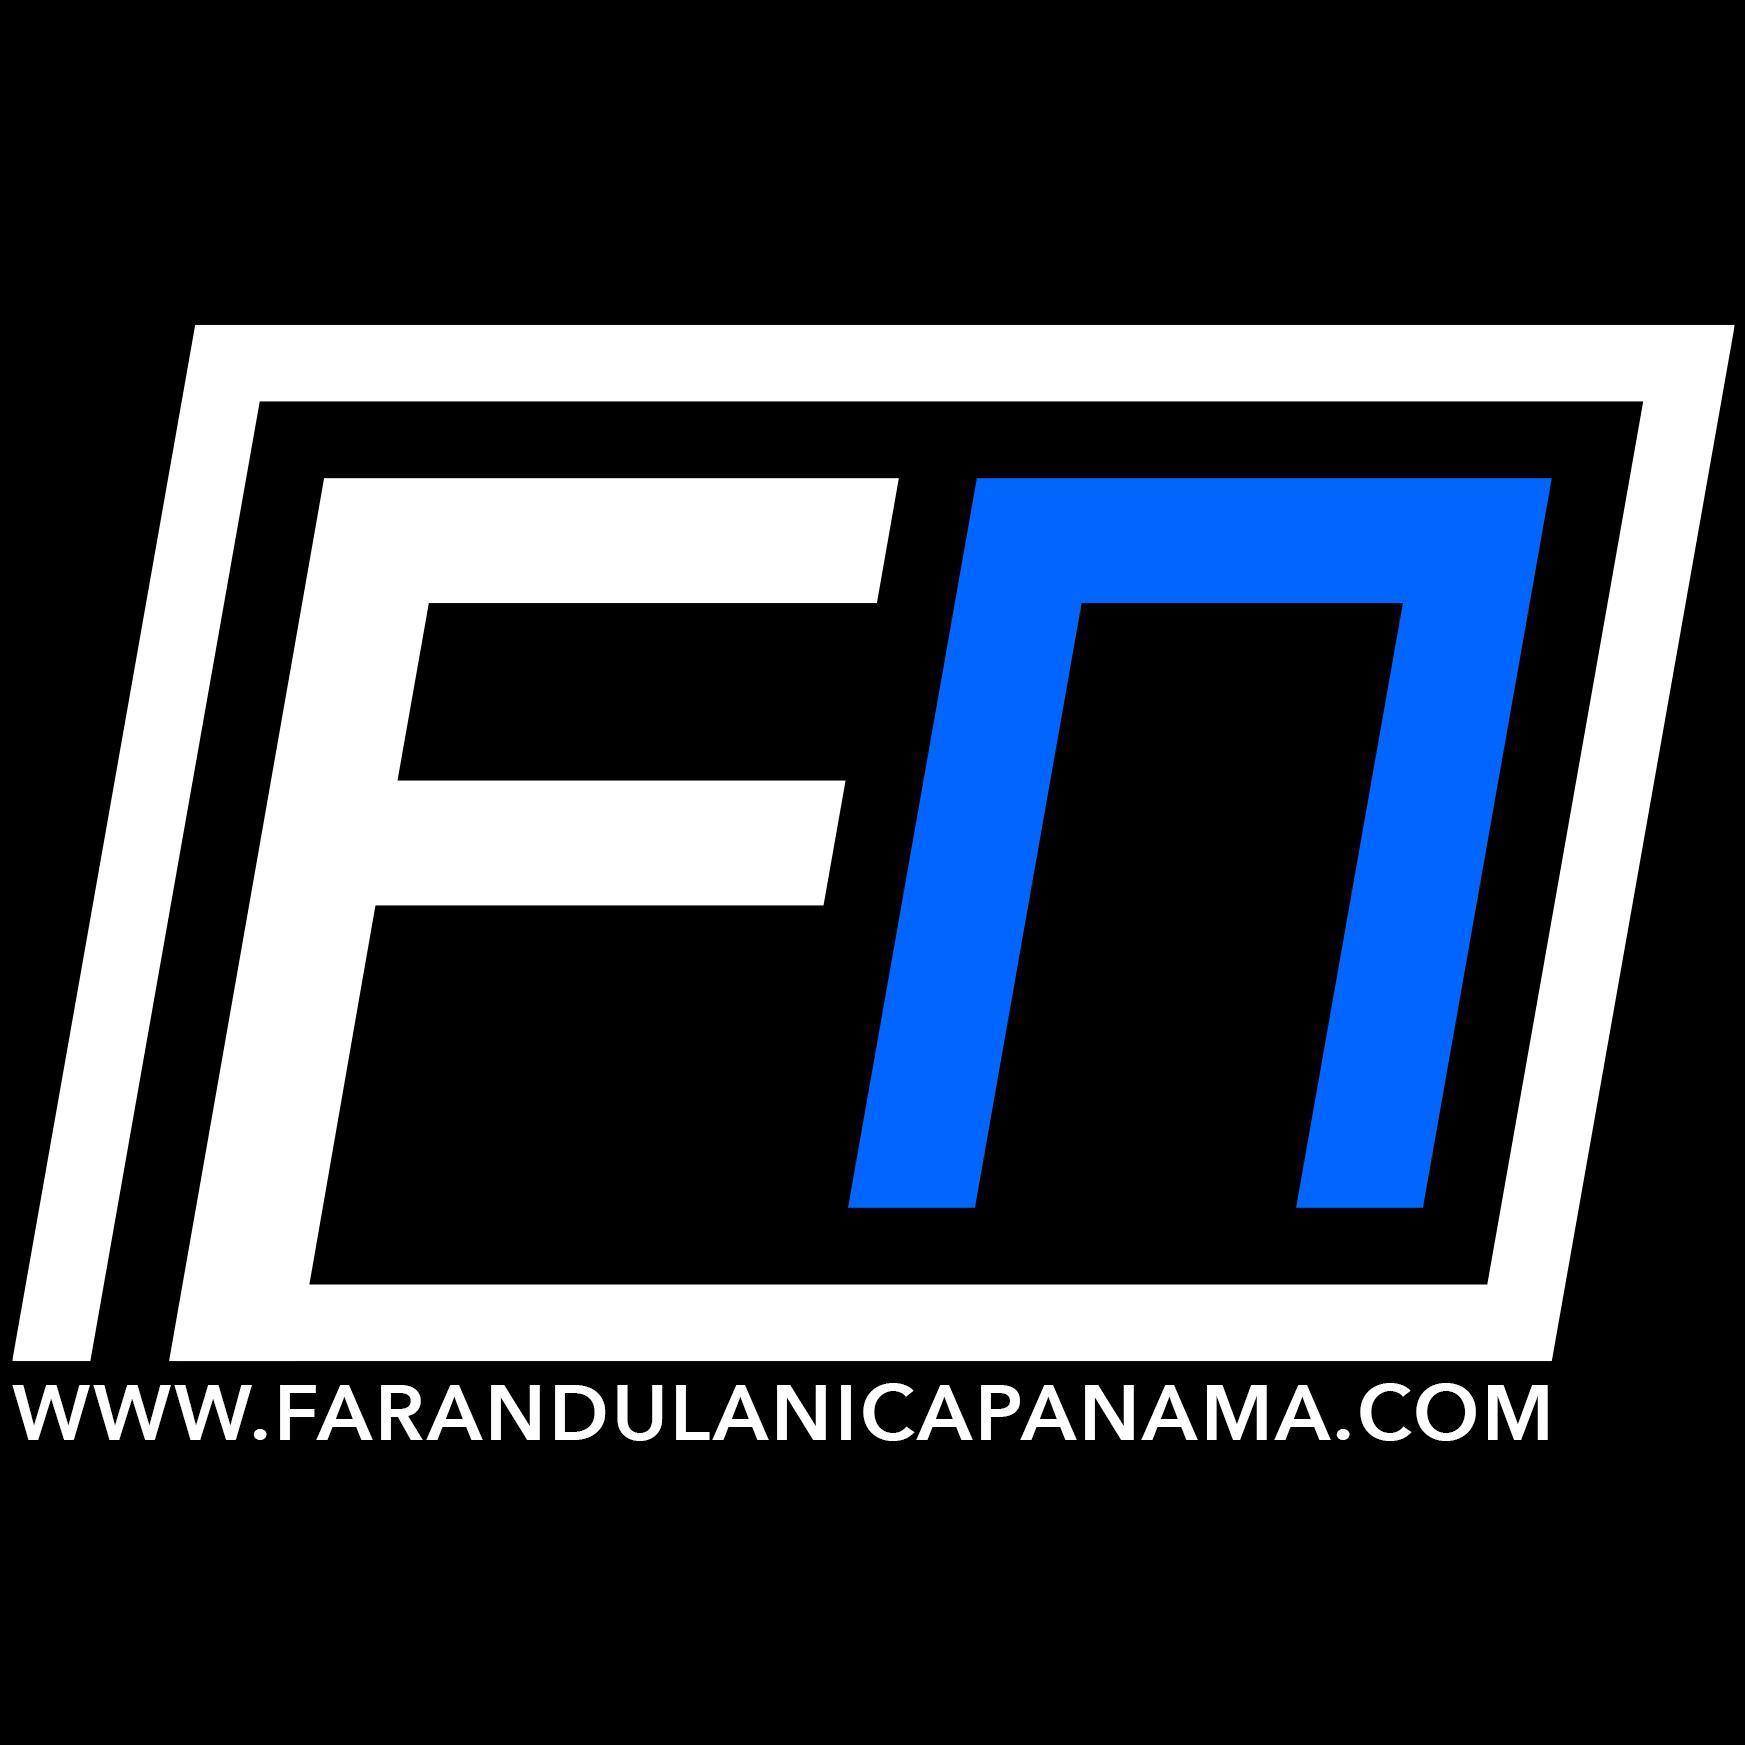 FarandulaNicaPanama